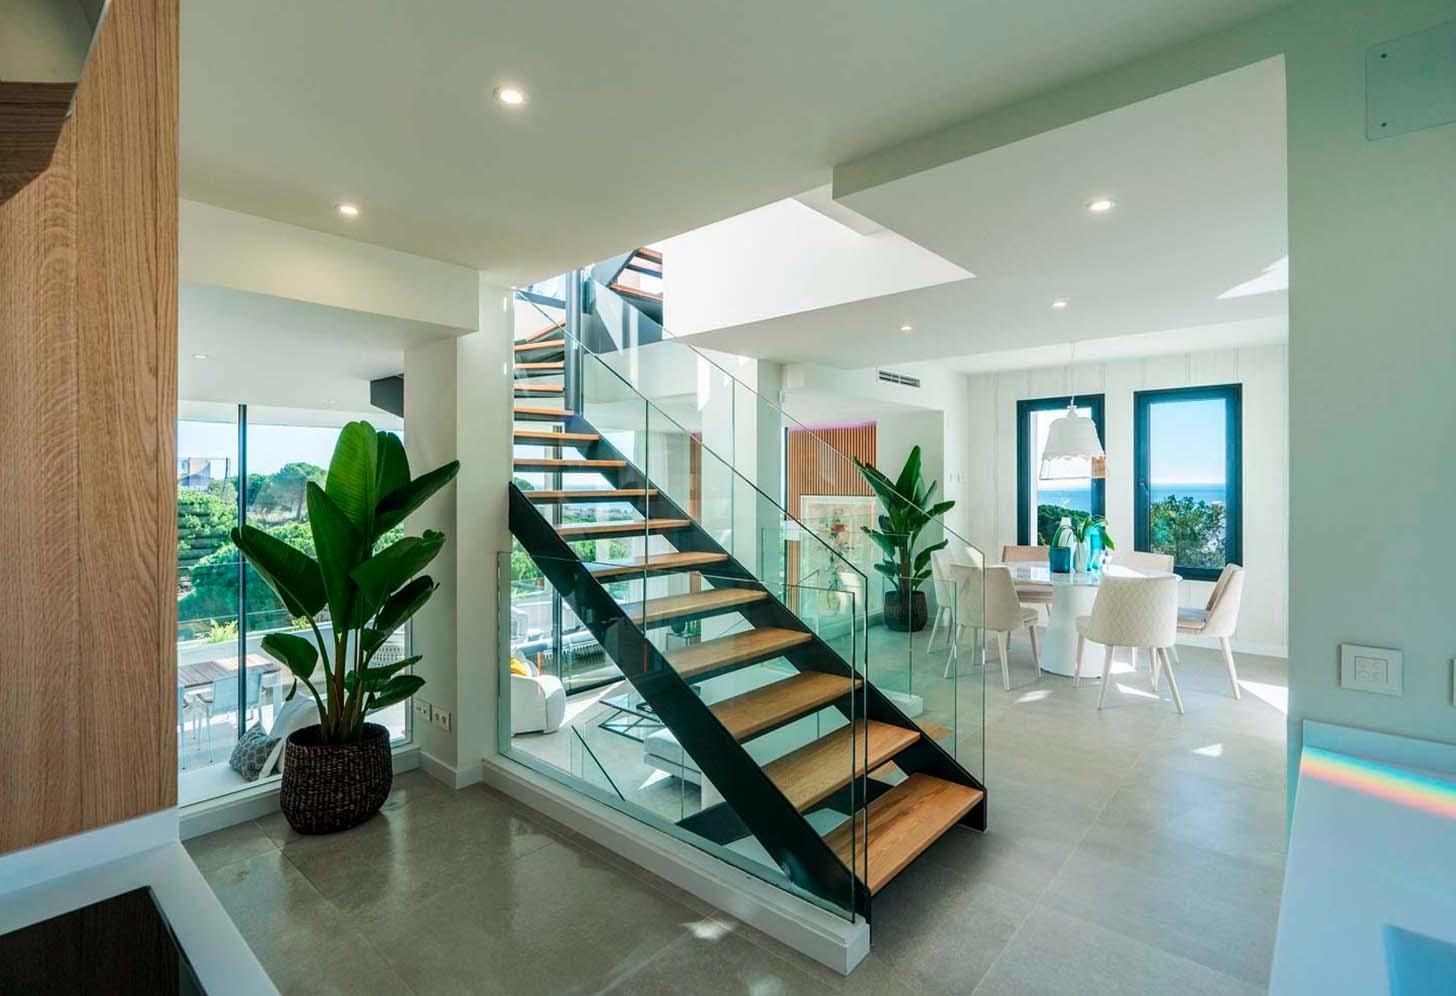 immobilier neuf espagne costa sol marbella escaliers